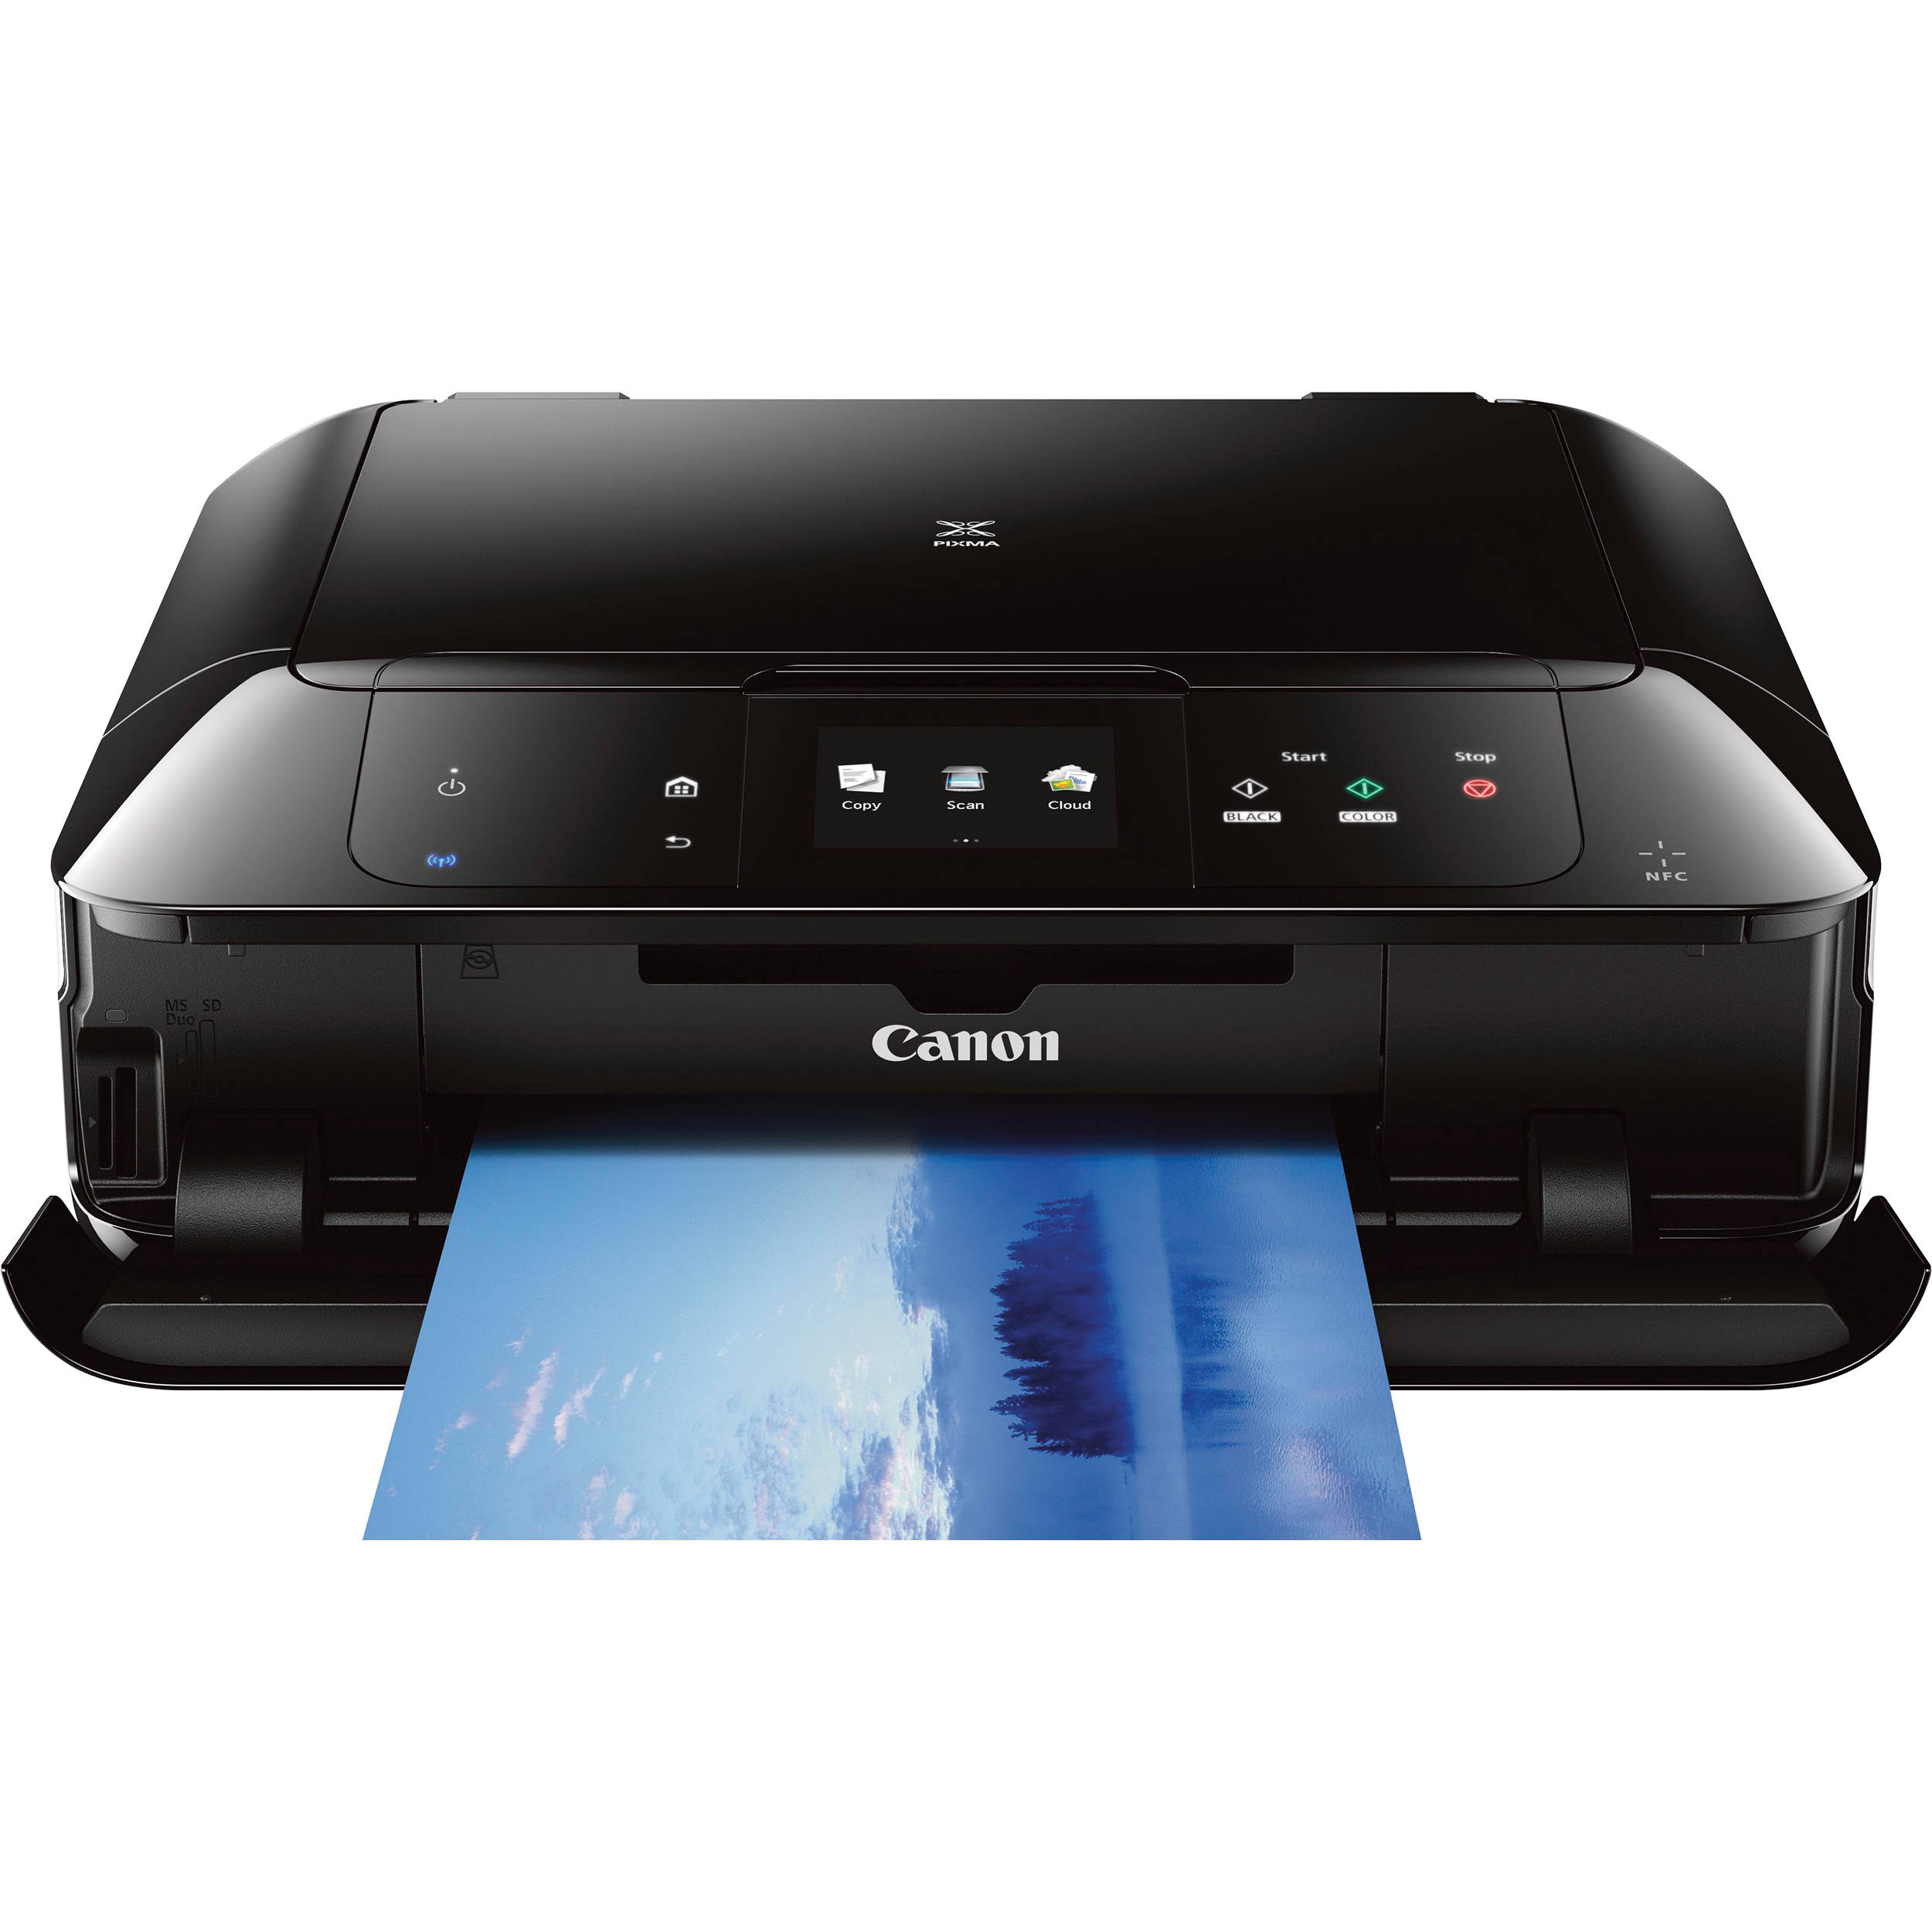 PIXMA MG7520 Wireless All-in-One Inkjet Printer (Black)